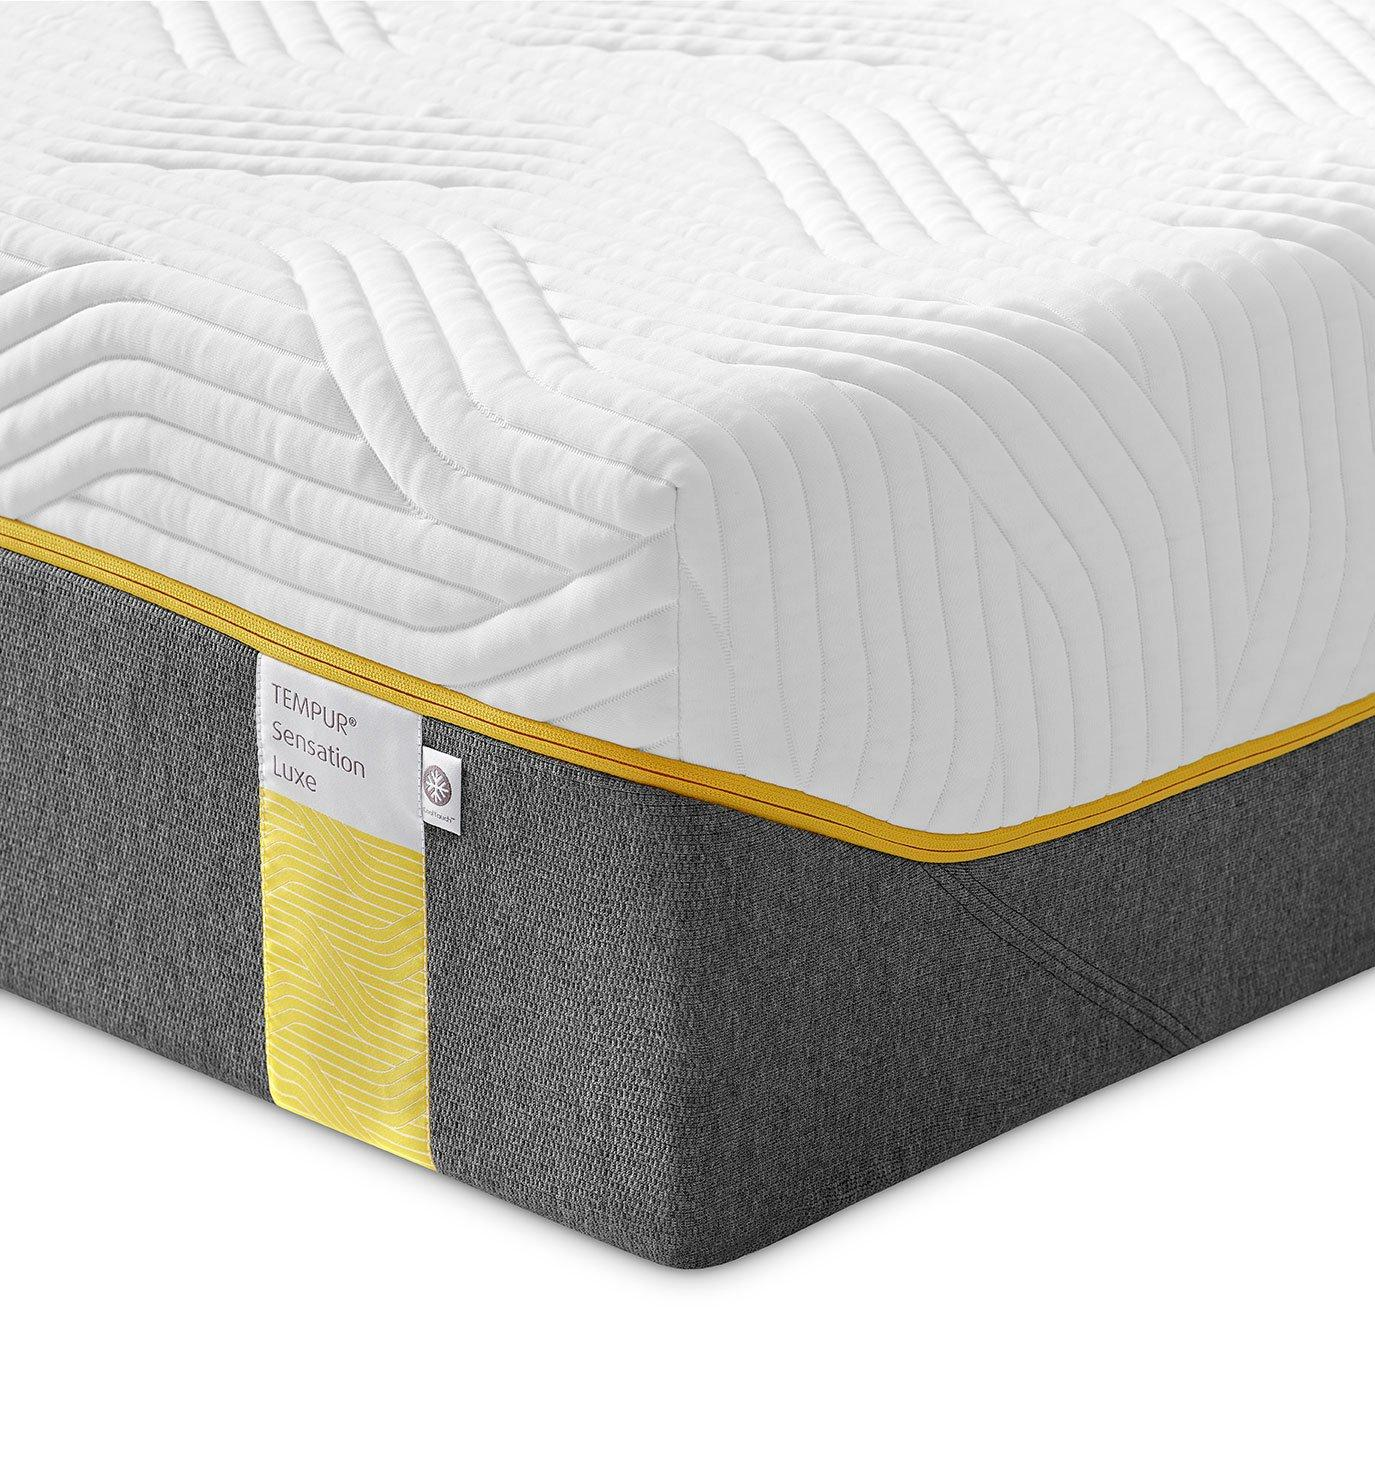 tempur sensation matras gasse slaapcomfort 5